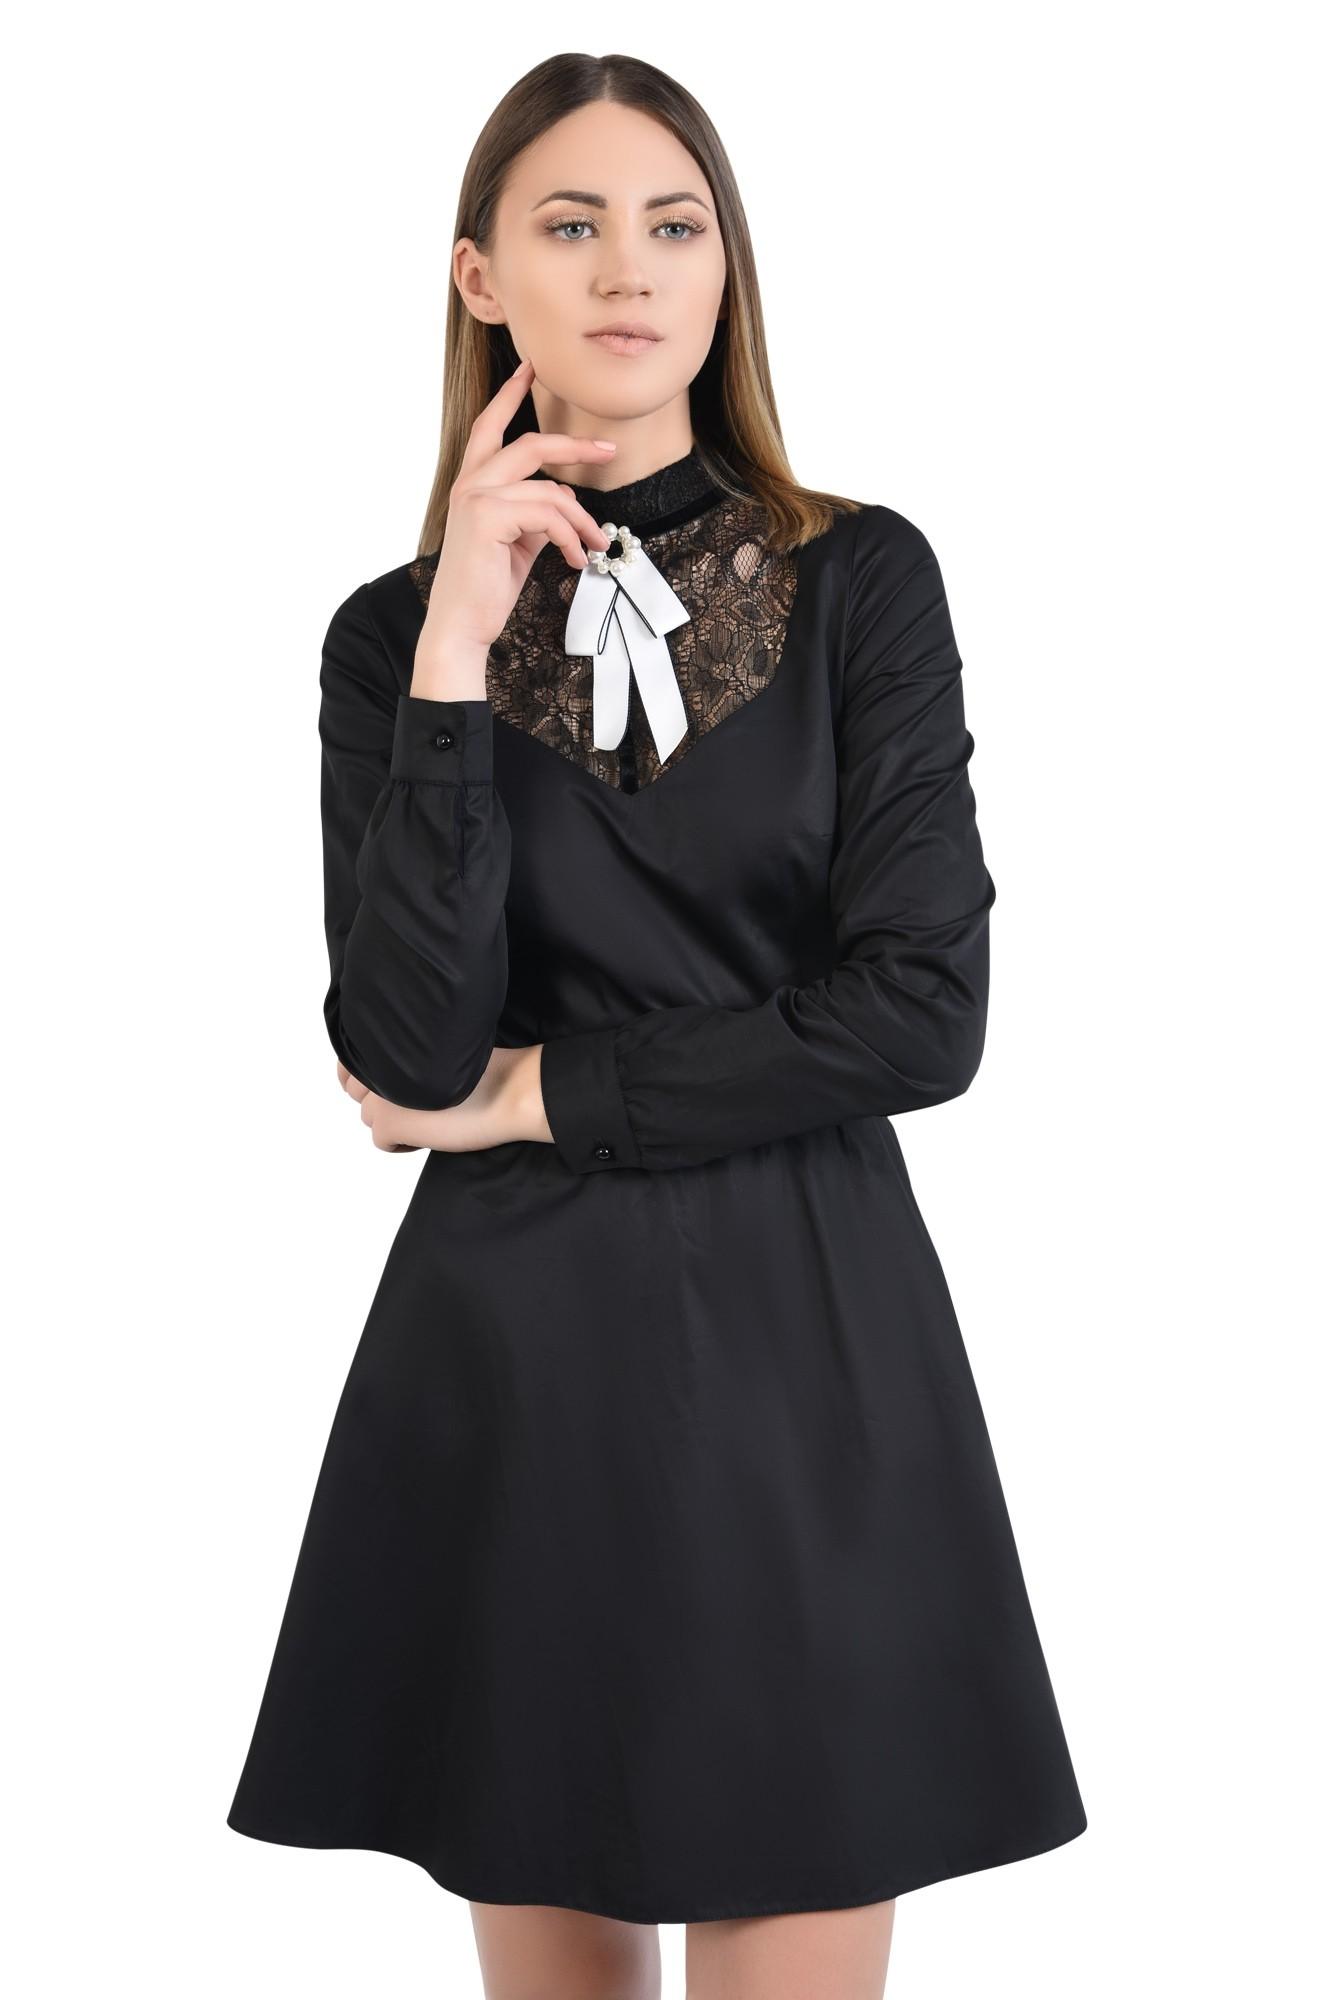 0 - rochie neagra, cu platca din dantela, cu brosa, croi evazat